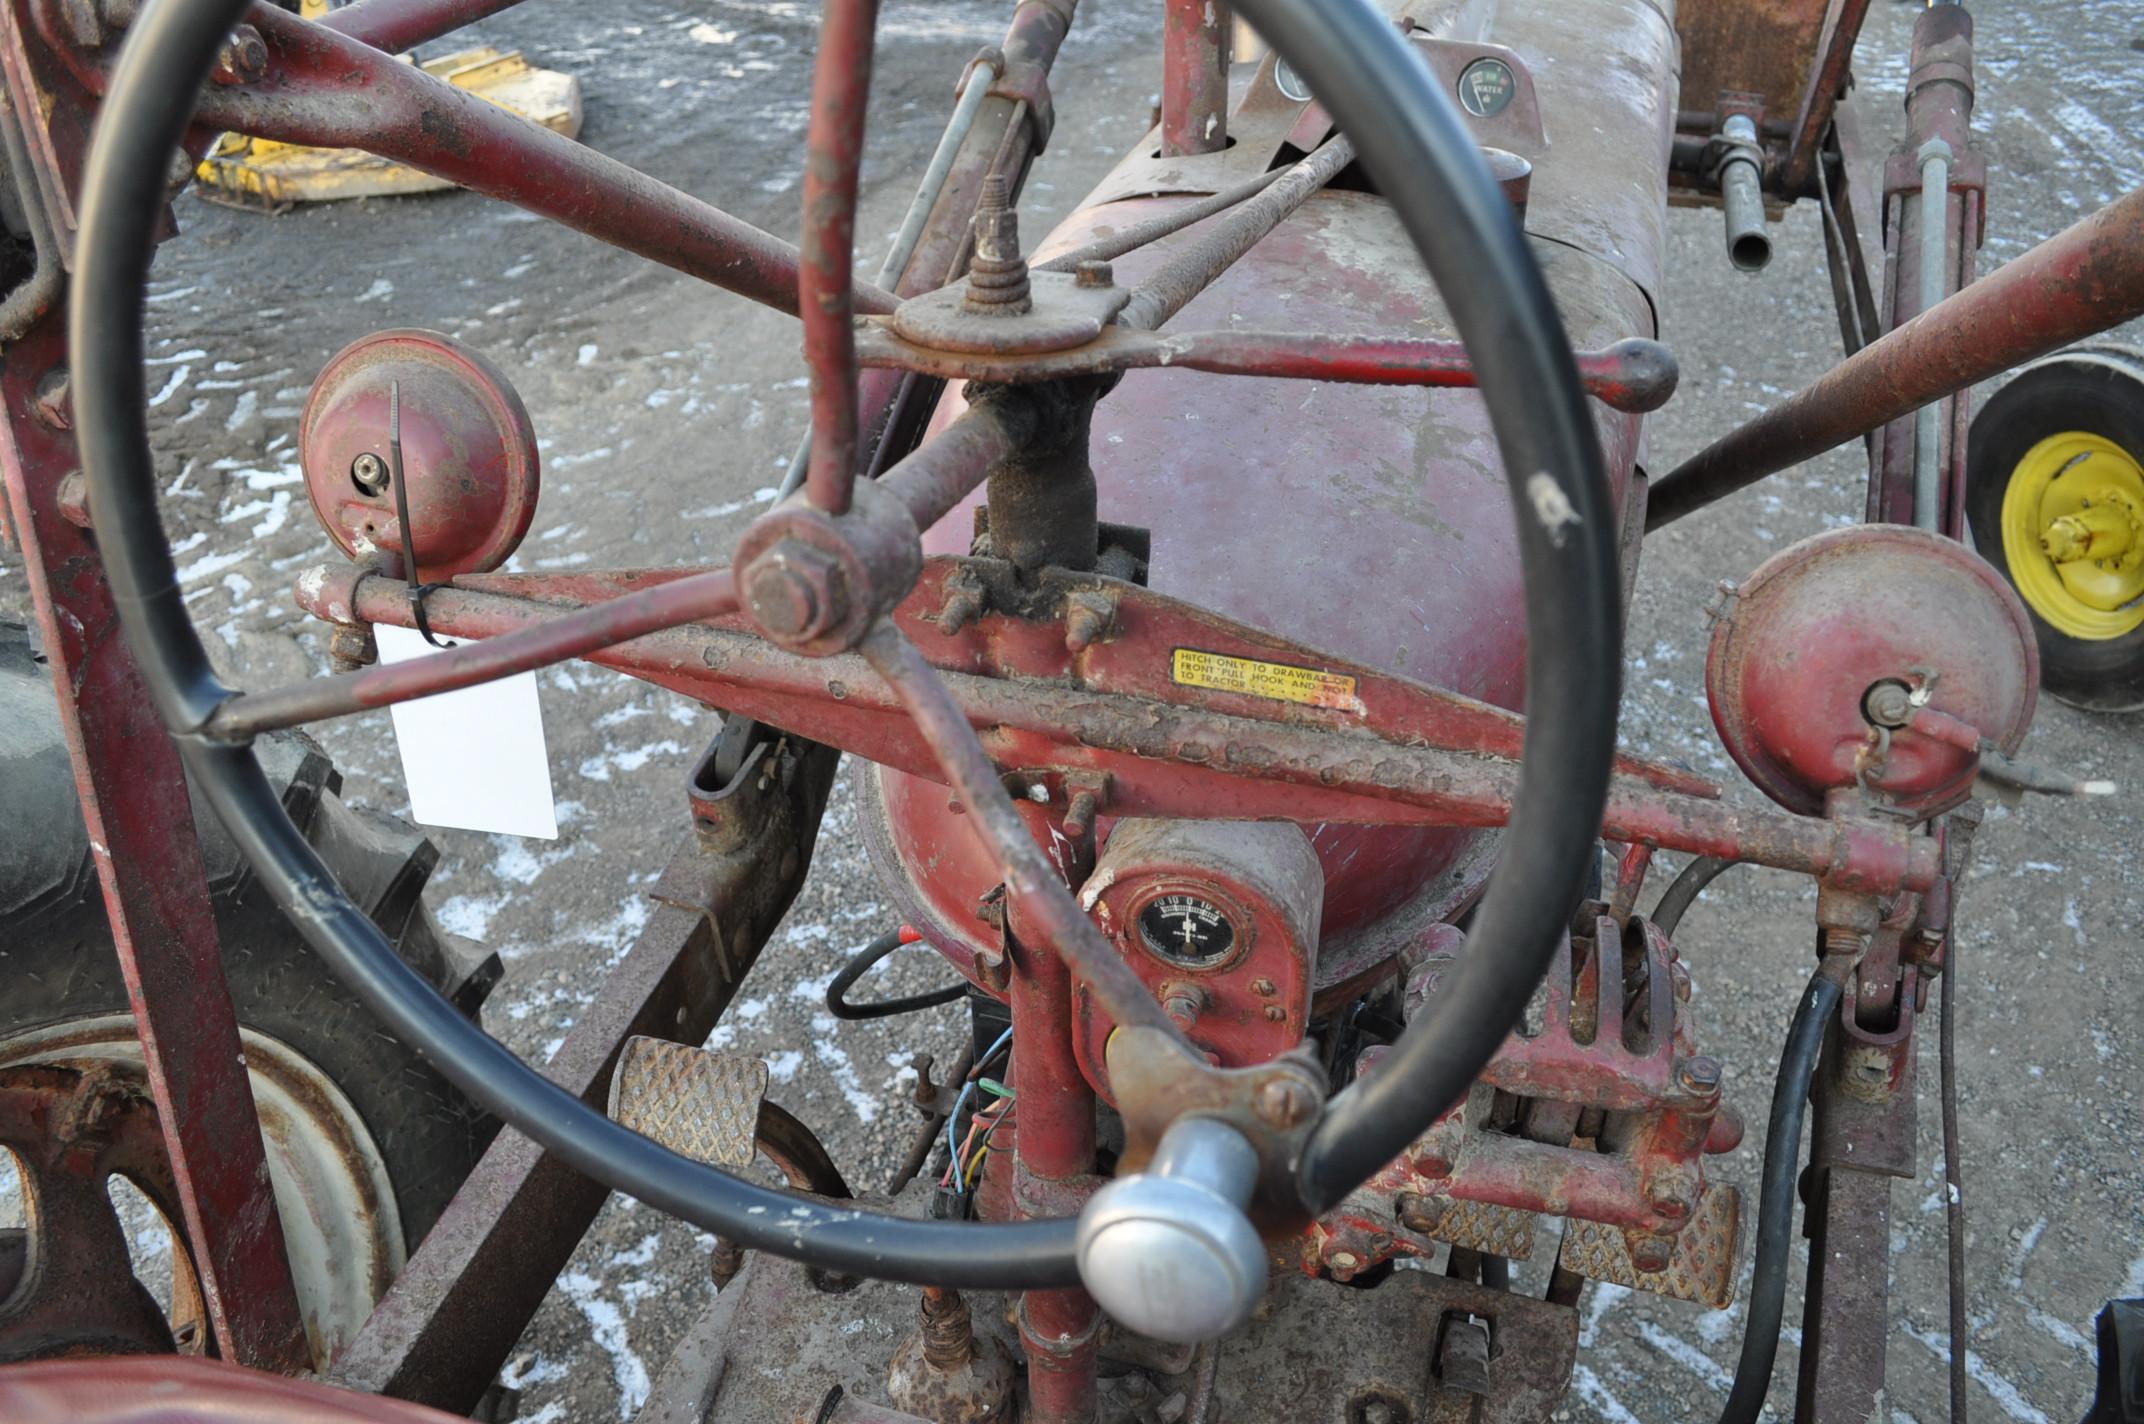 Farmall M tractor, 13.6-38 rear, narrow front, gasoline, loader, 540 PTO, SN FBK276 - Image 10 of 11